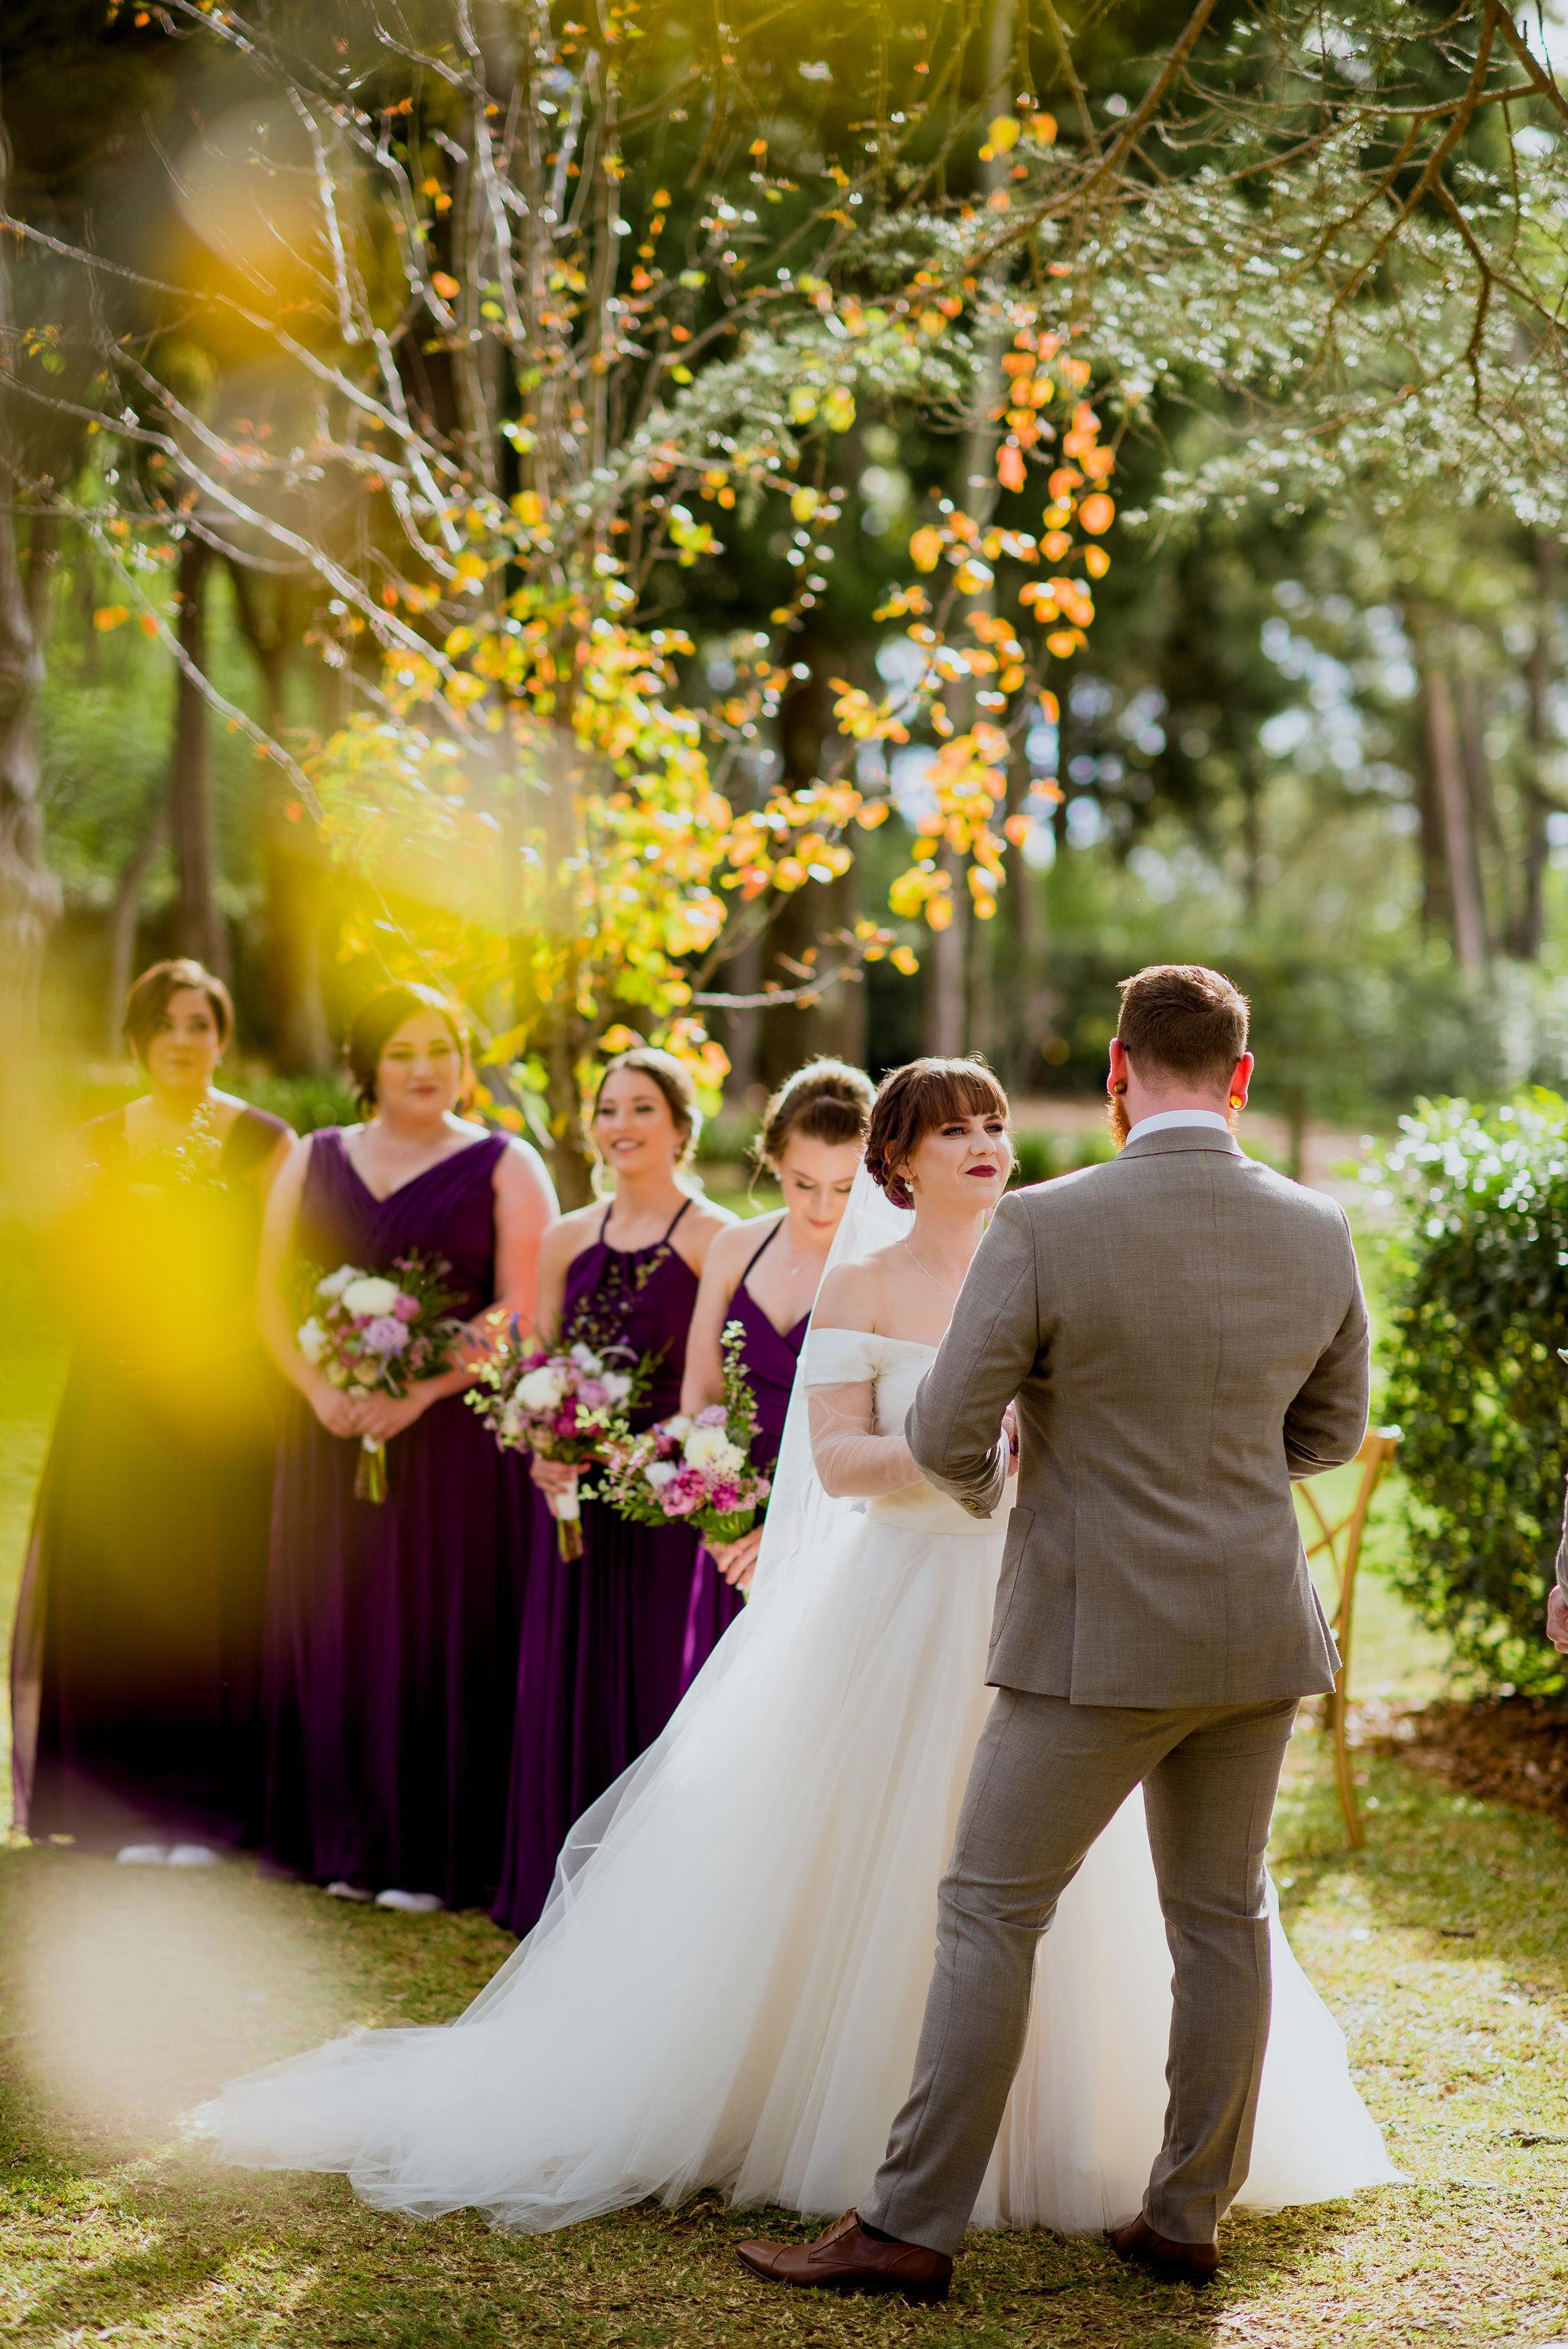 Bride smiling during her wedding vows in a garden